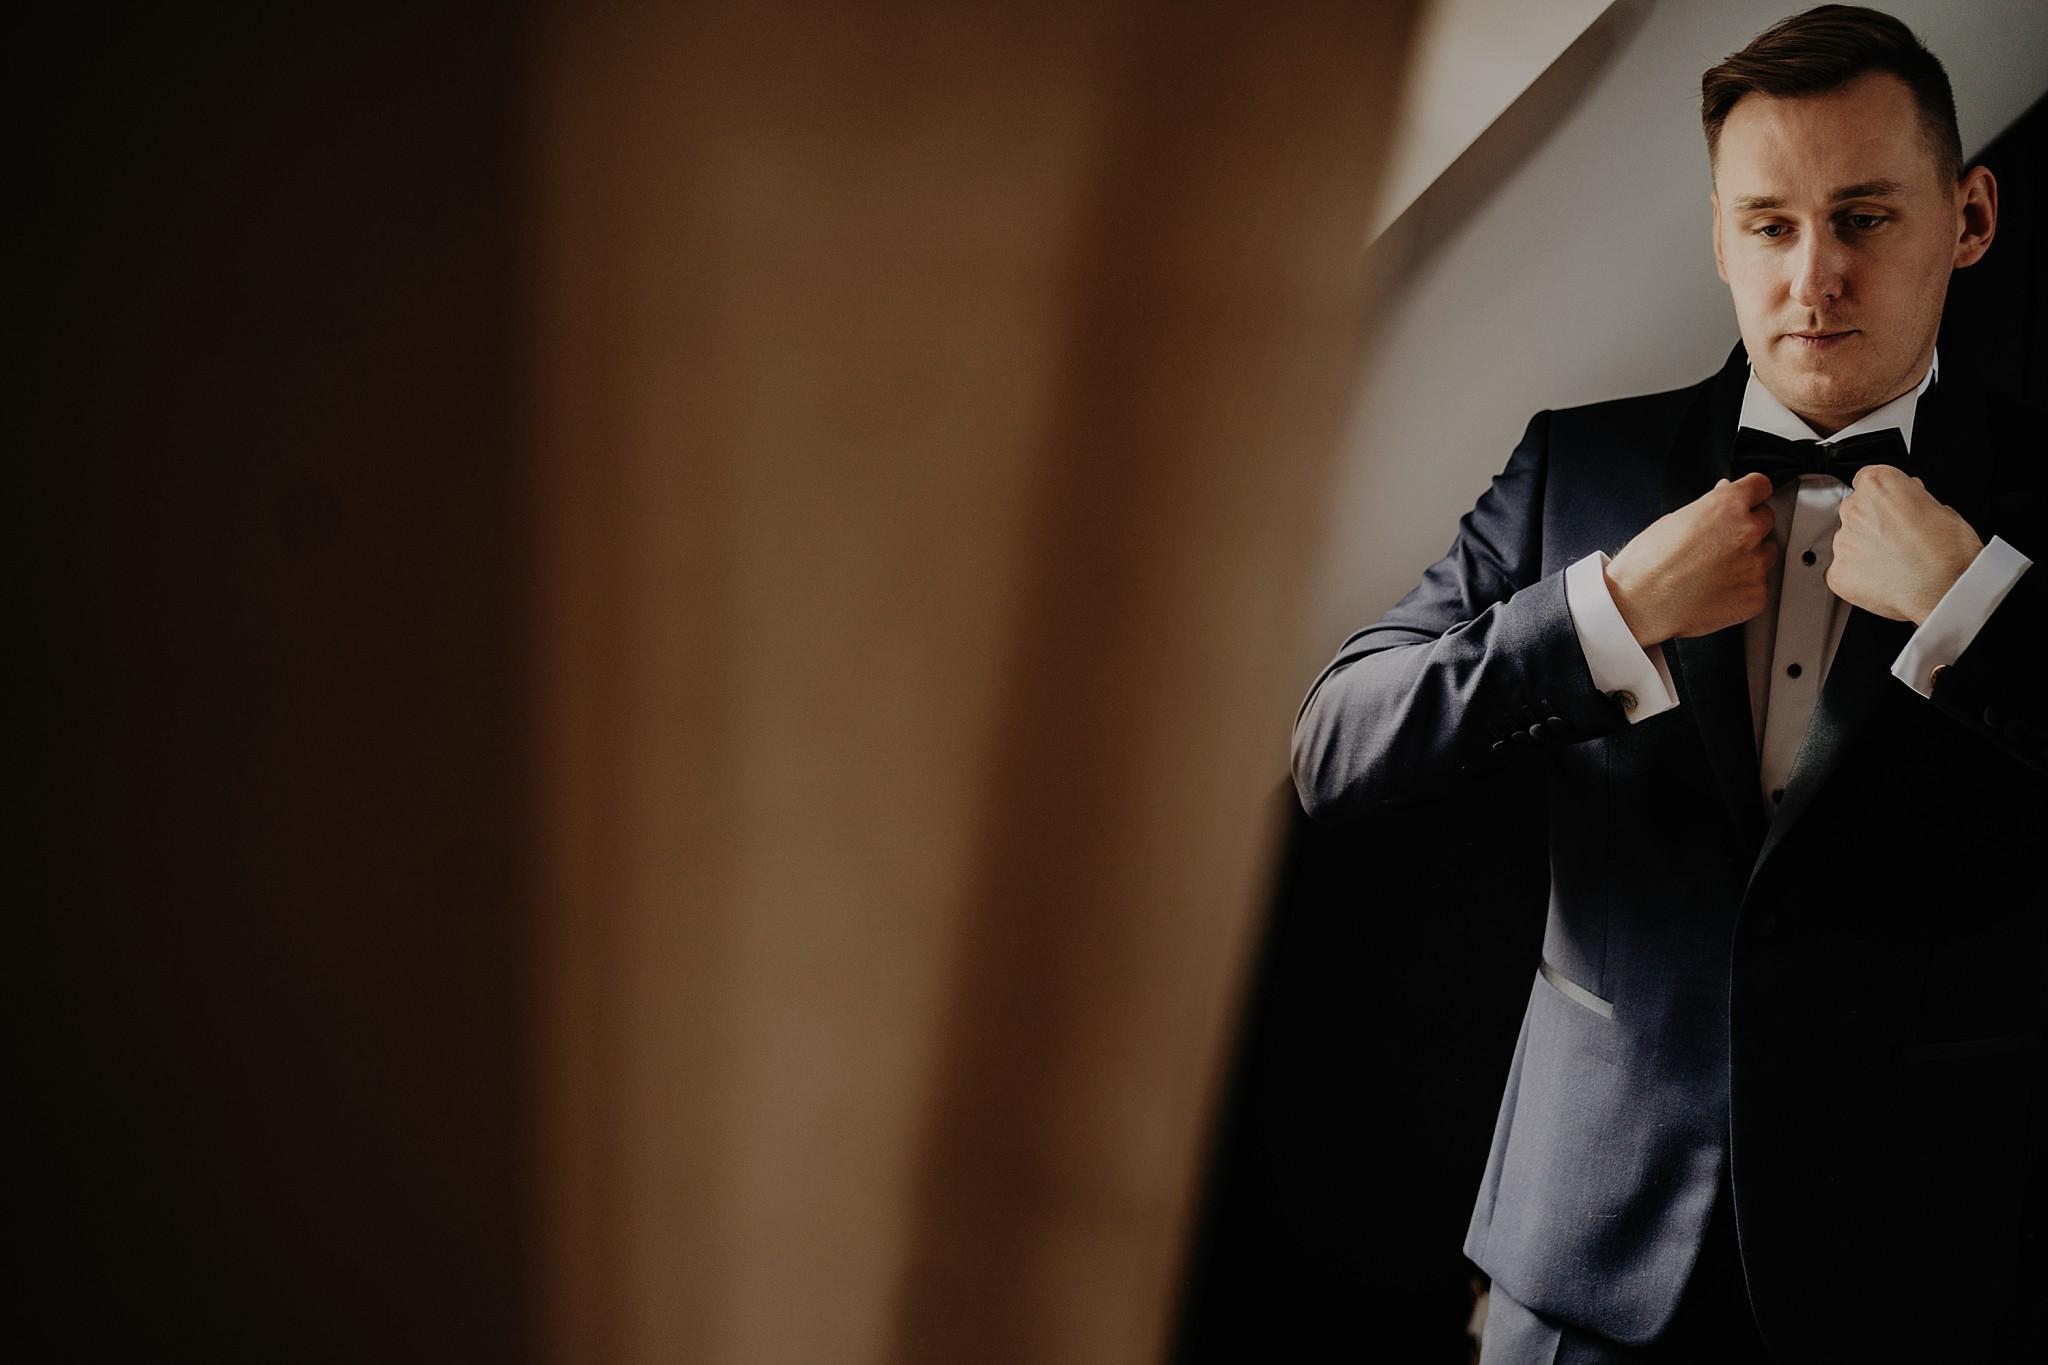 fotograf poznan wesele dobra truskawka piekne wesele pod poznaniem wesele w dobrej truskawce piekna para mloda slub marzen slub koronawirus slub listopad wesele koronawirus 062